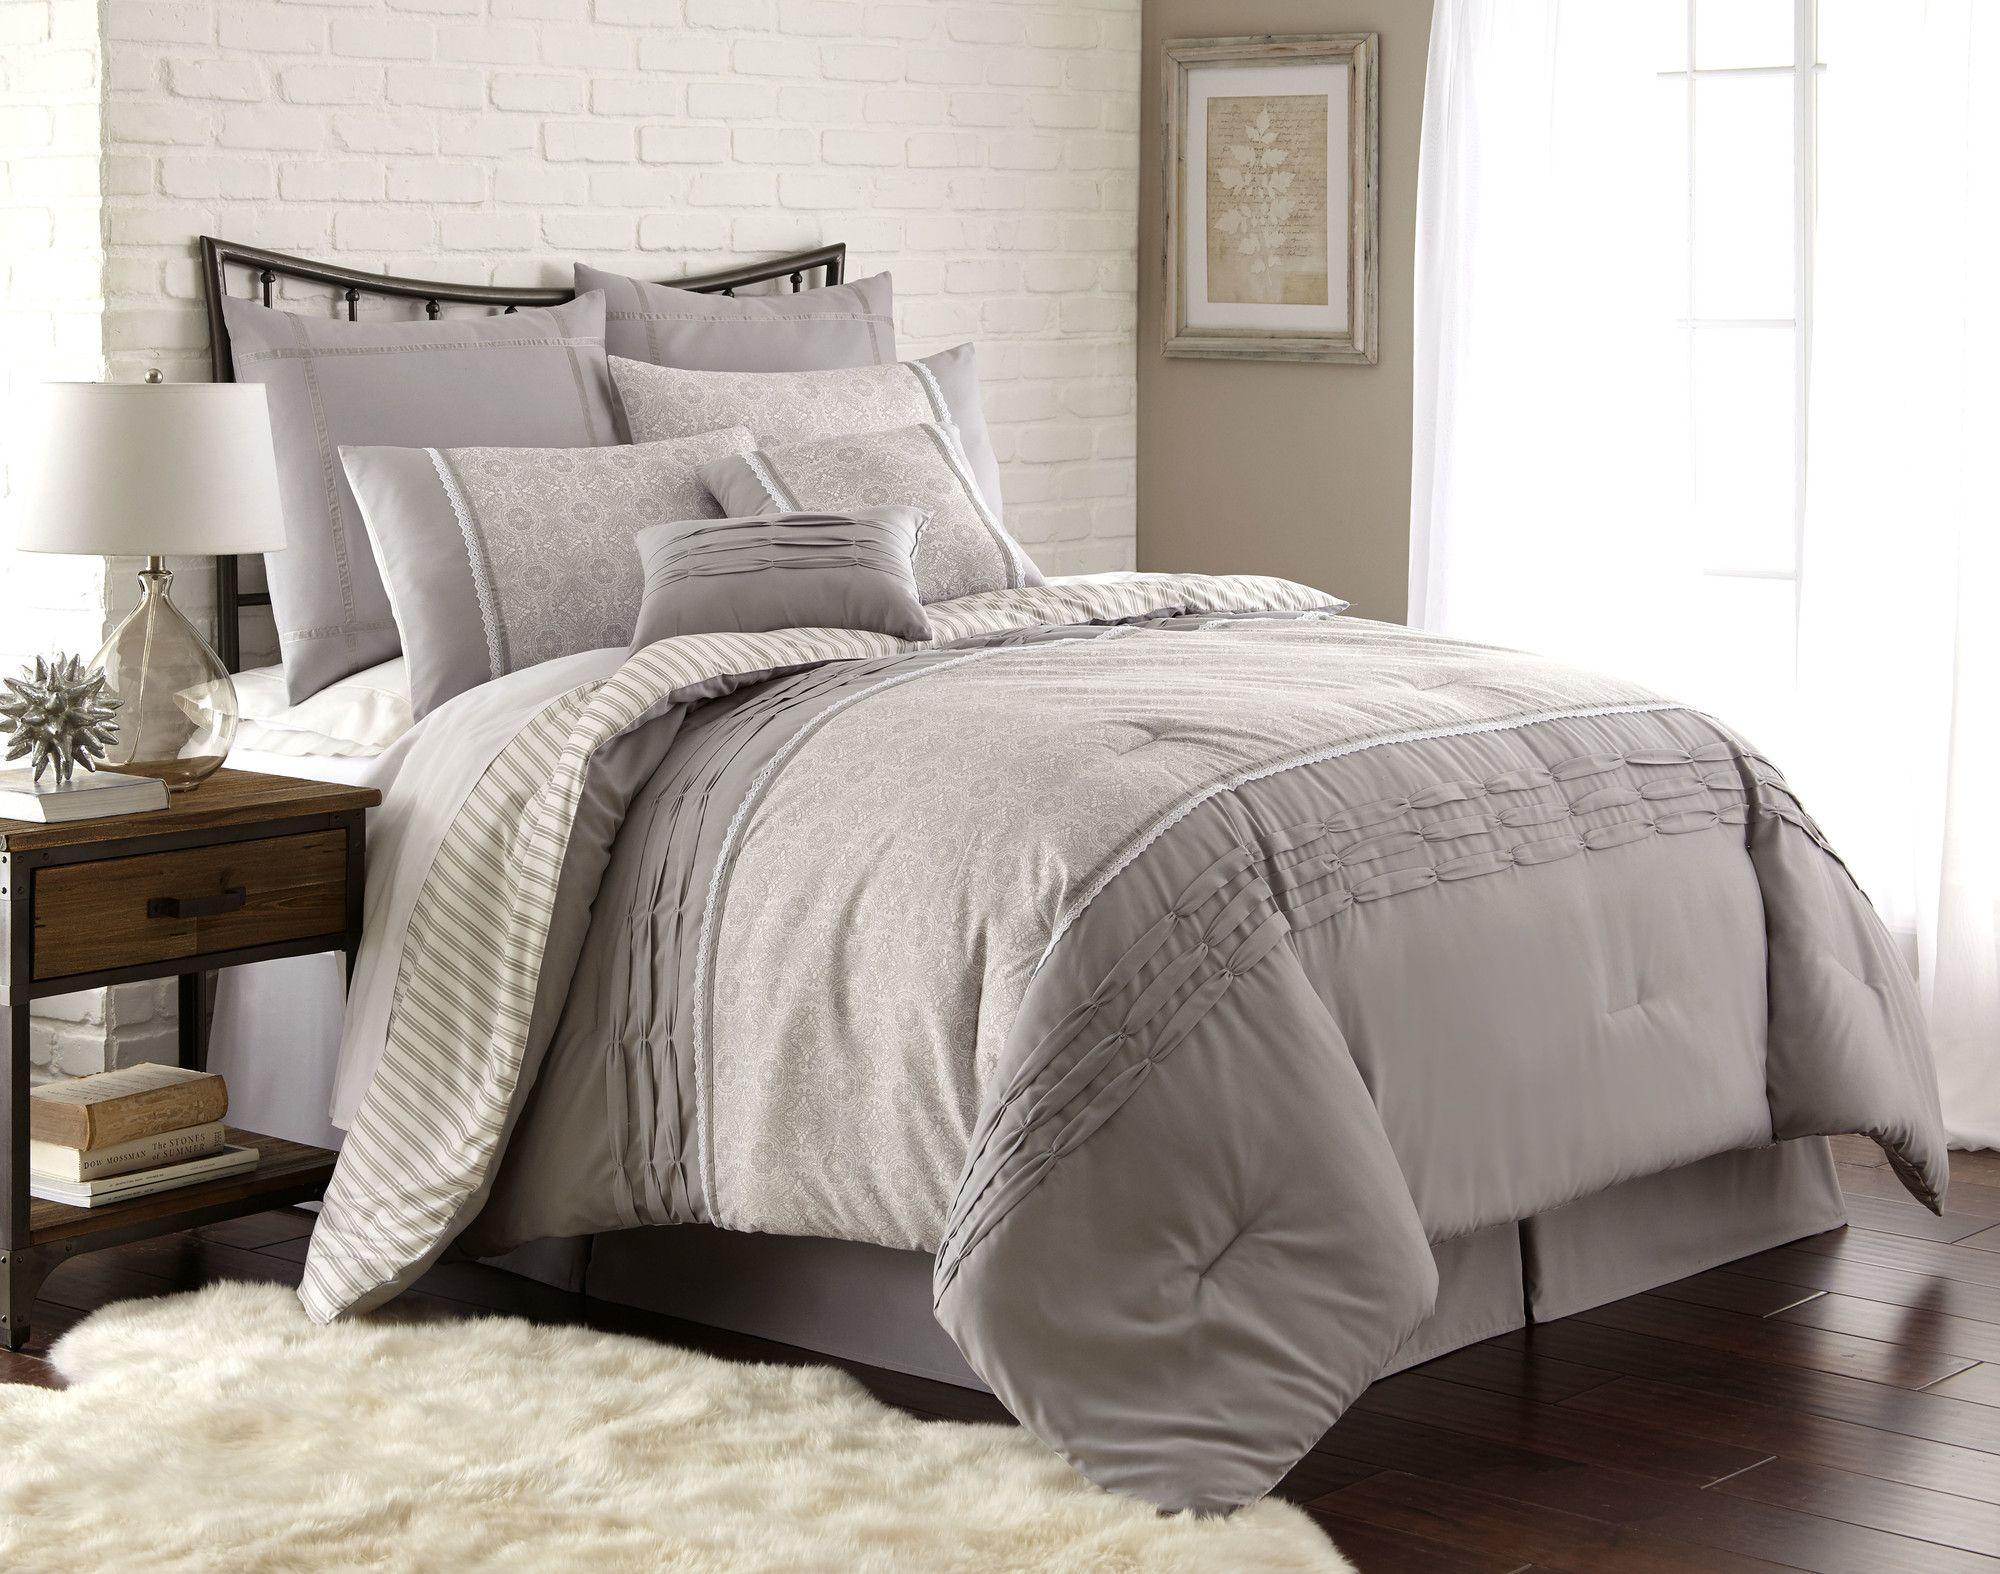 Musquee 8 Piece Comforter Set Comforter Sets Bedding Sets